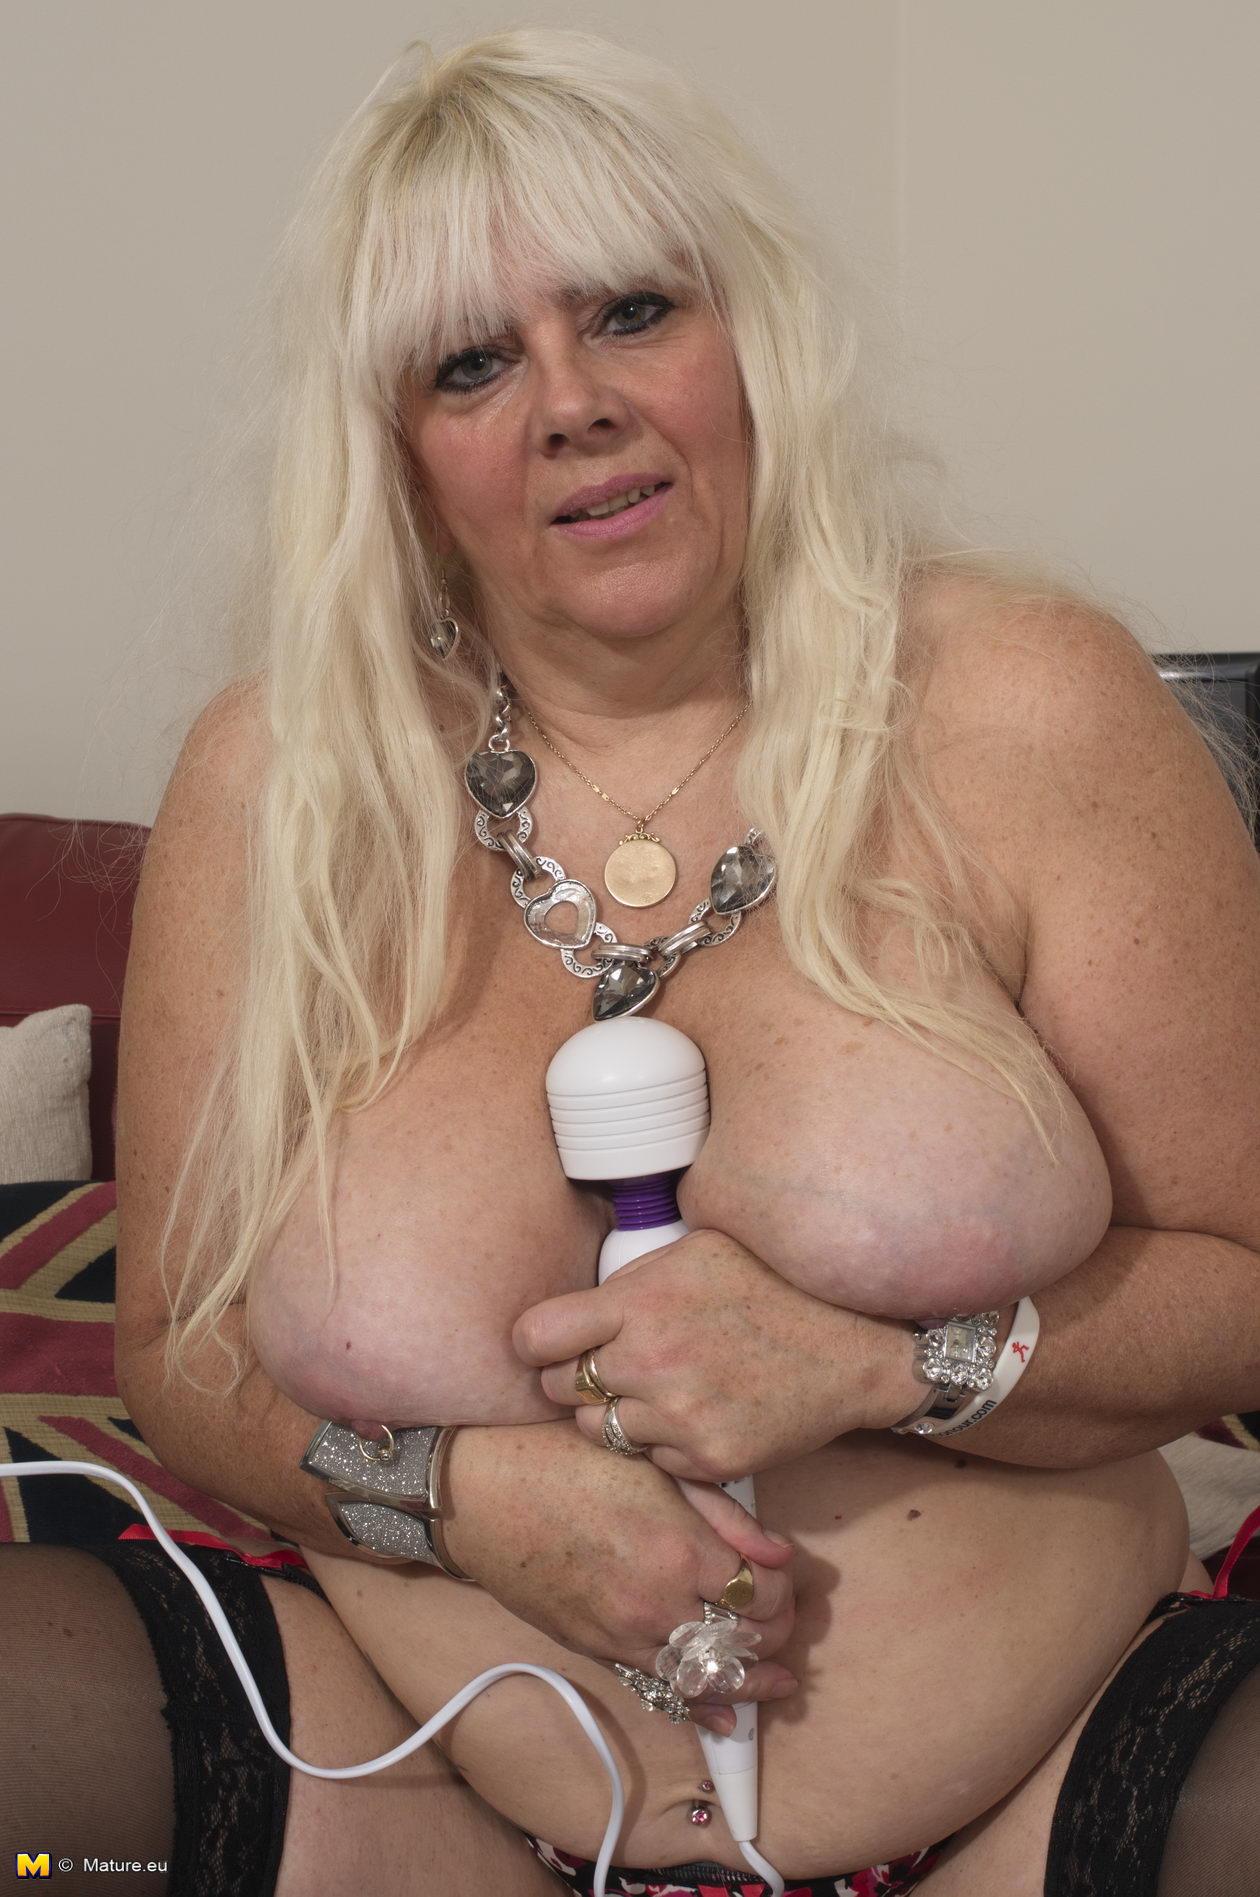 Chubby mature blonde bbw tease